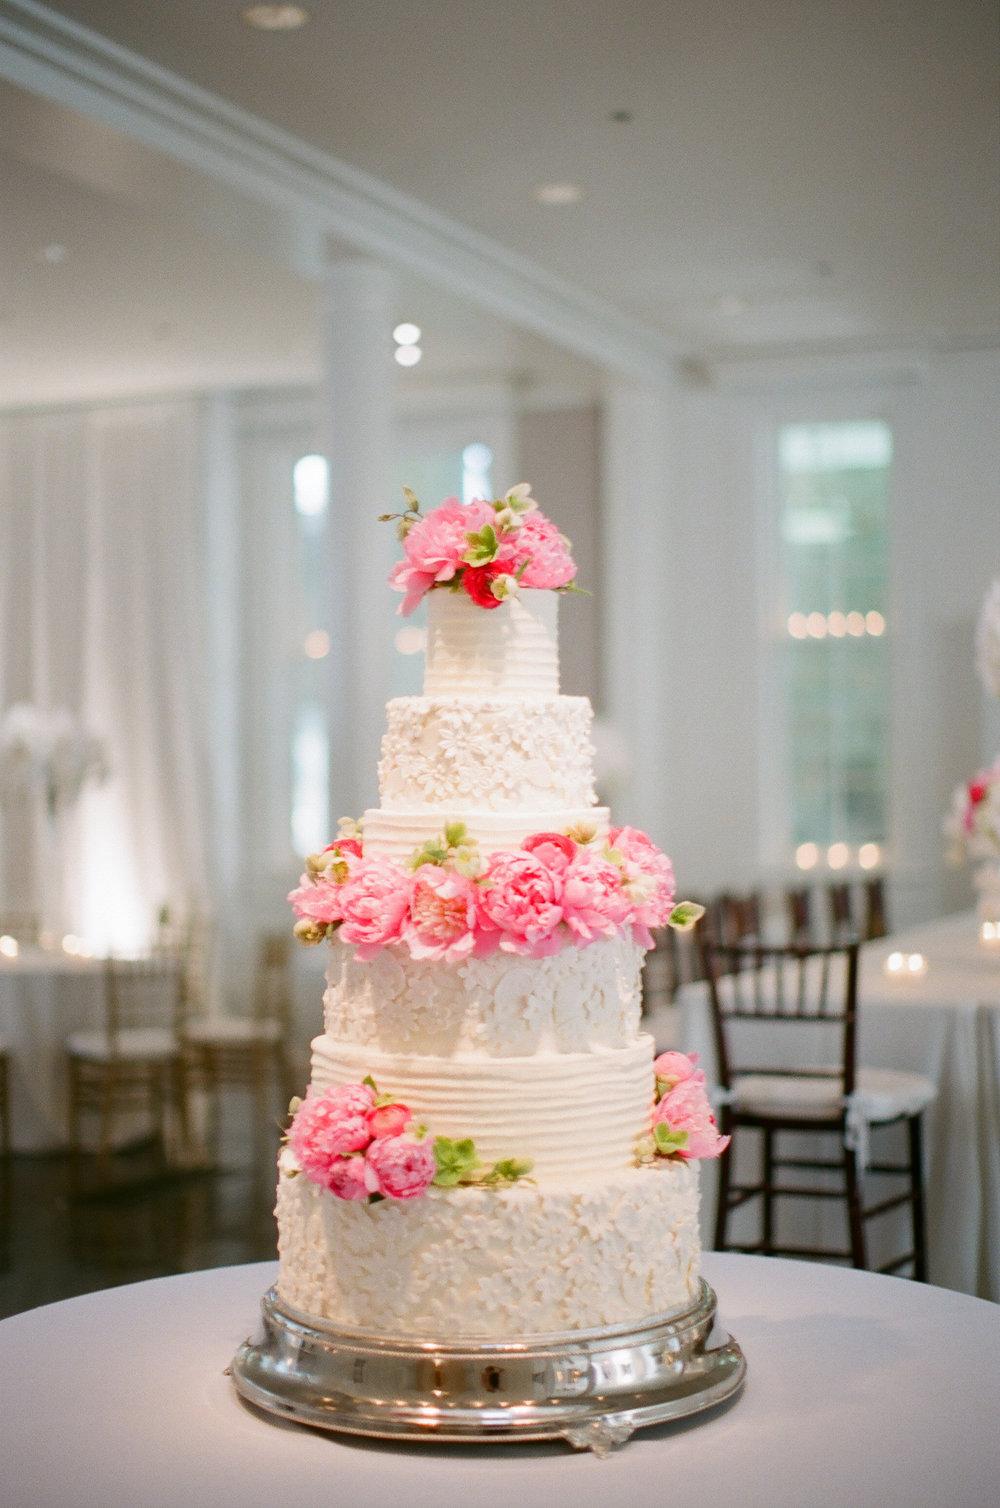 Peonies, wedding cake